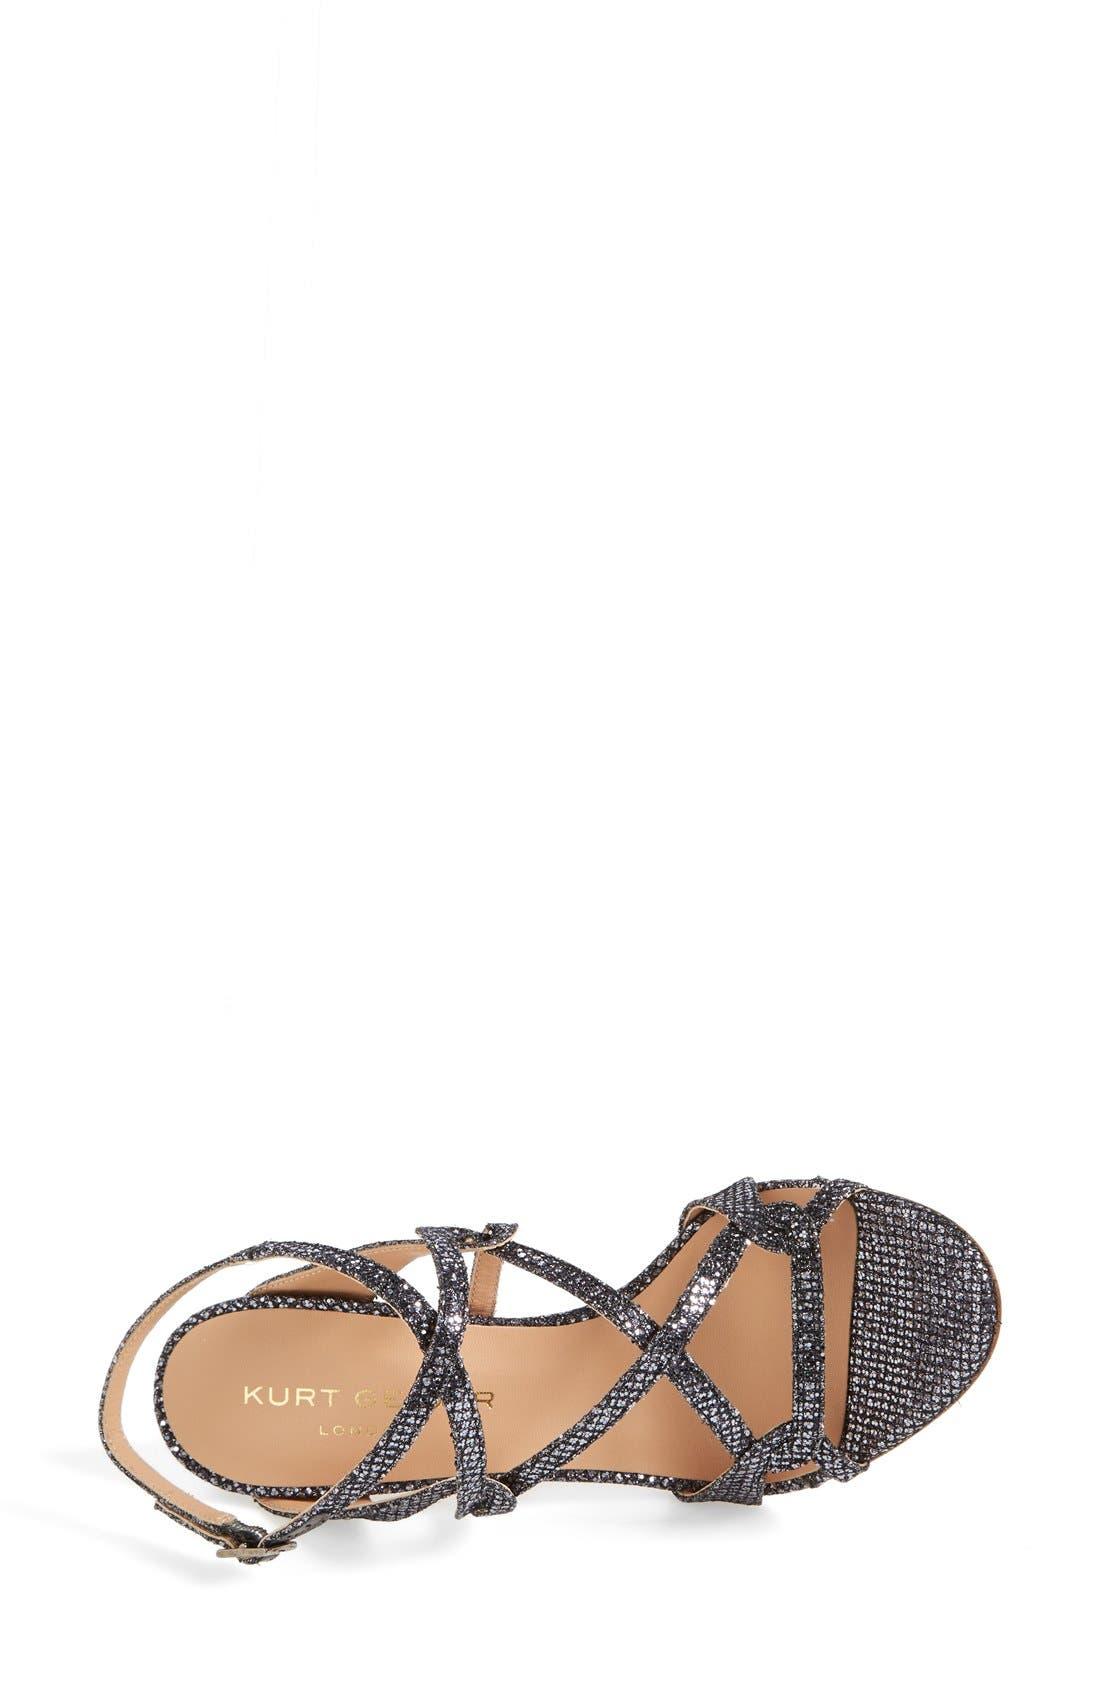 Alternate Image 3  - Kurt Geiger London 'Maxi' Strappy Sandal (Women)